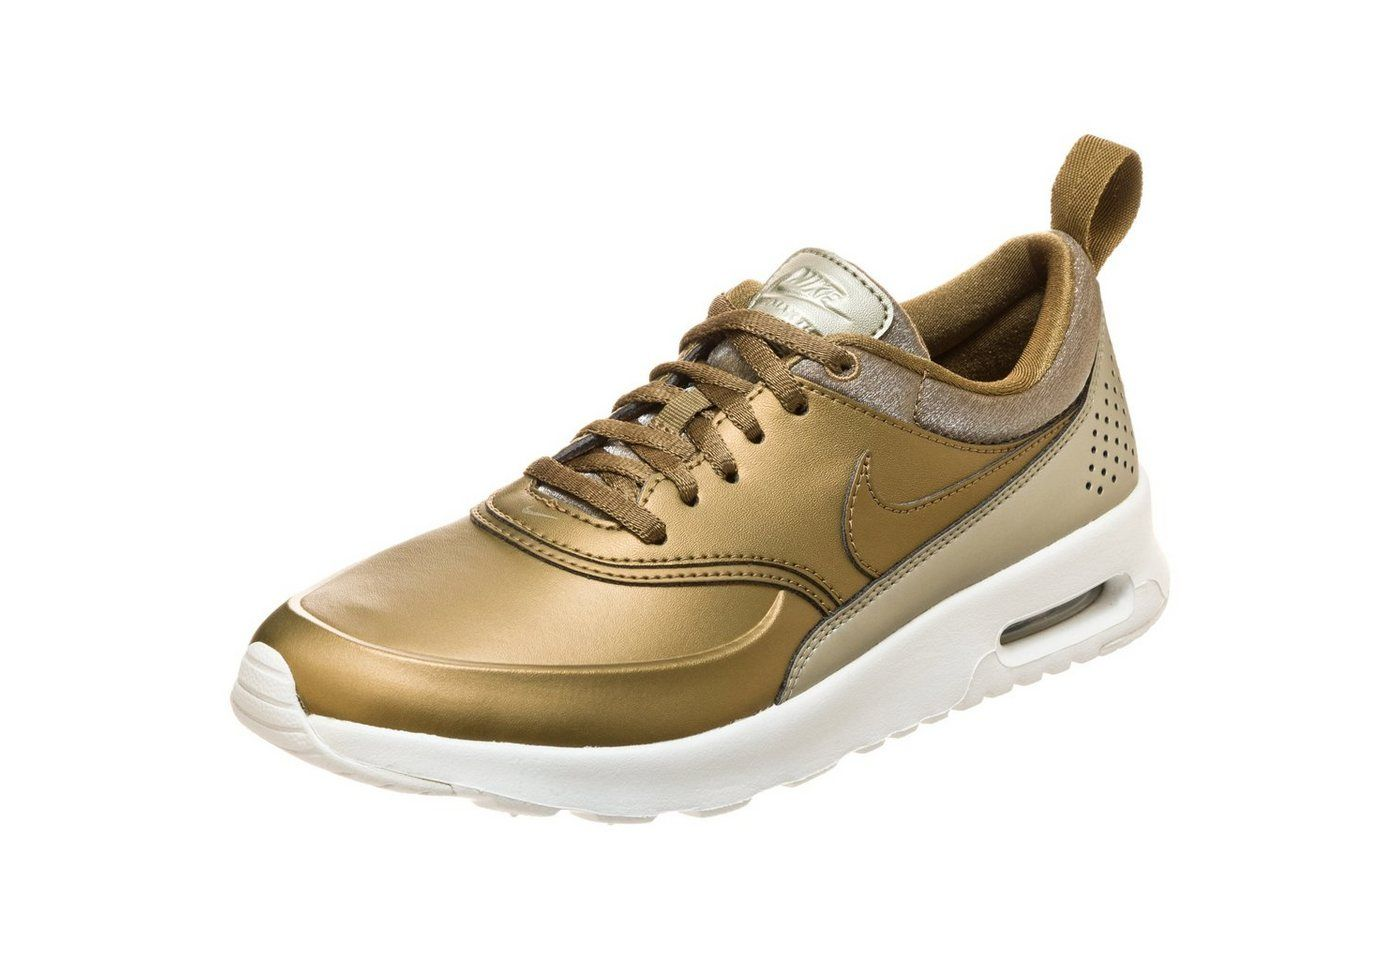 OTTOSALGDamen Nike Sportswear, Air Max Thea Premium SALG Damen Nike Sportswear , Air Max Thea Premium